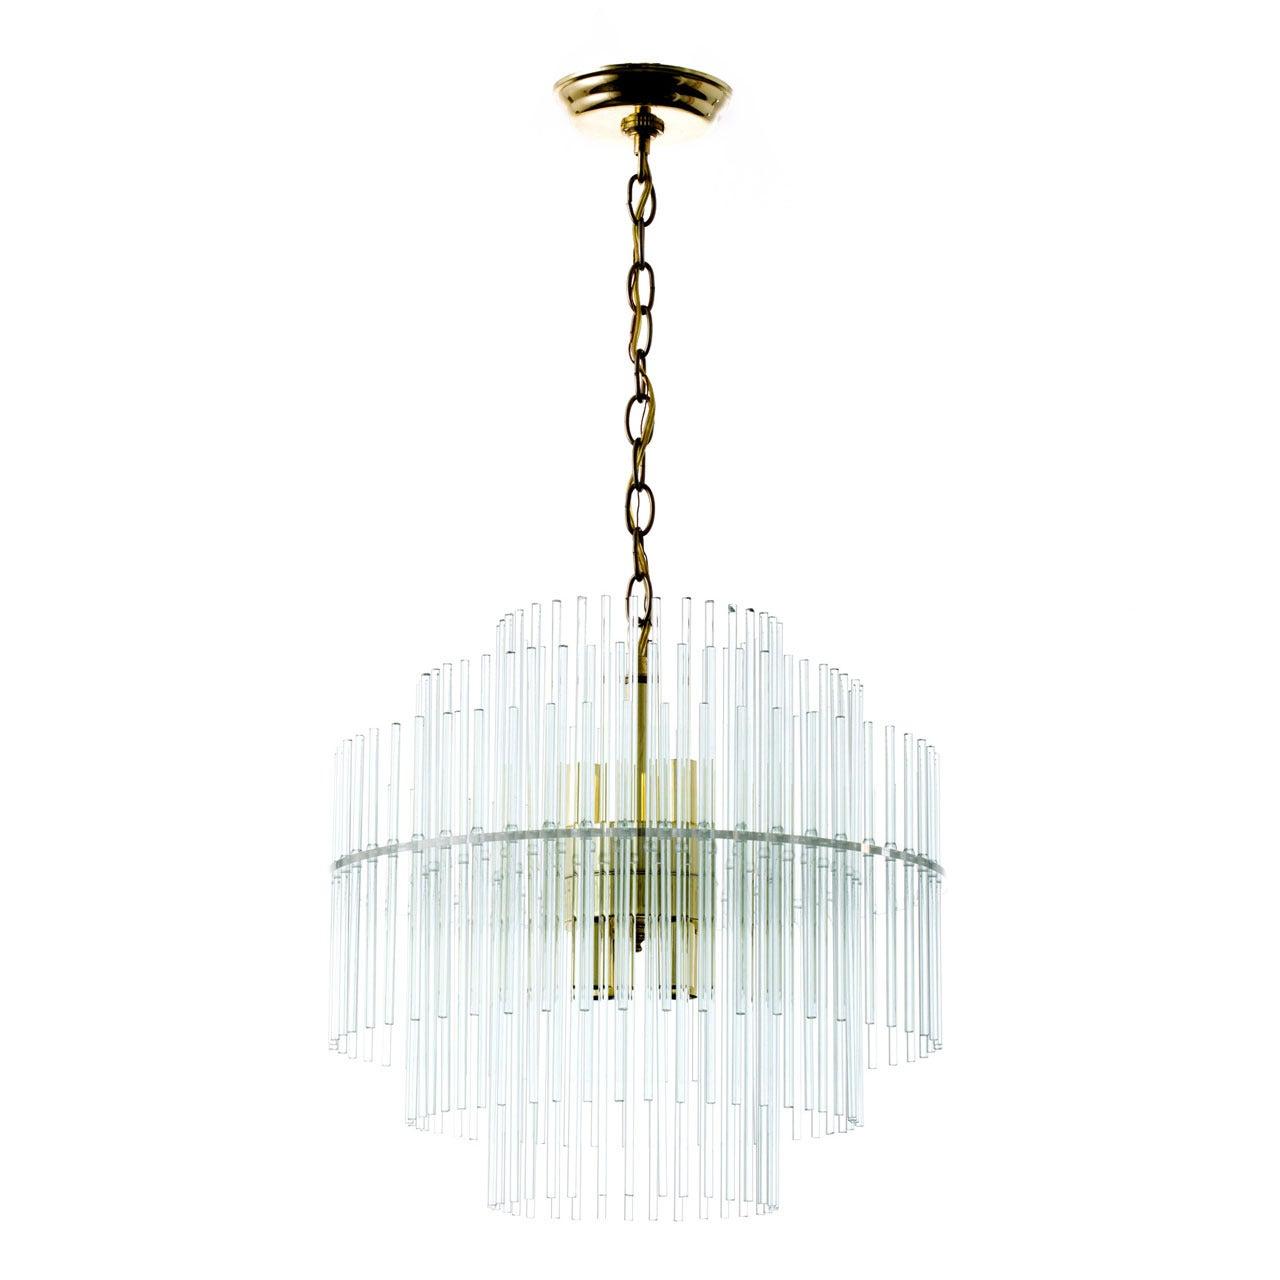 Glass Rod Five-Tier Chandelier Attributed to Gaetano Sciolari